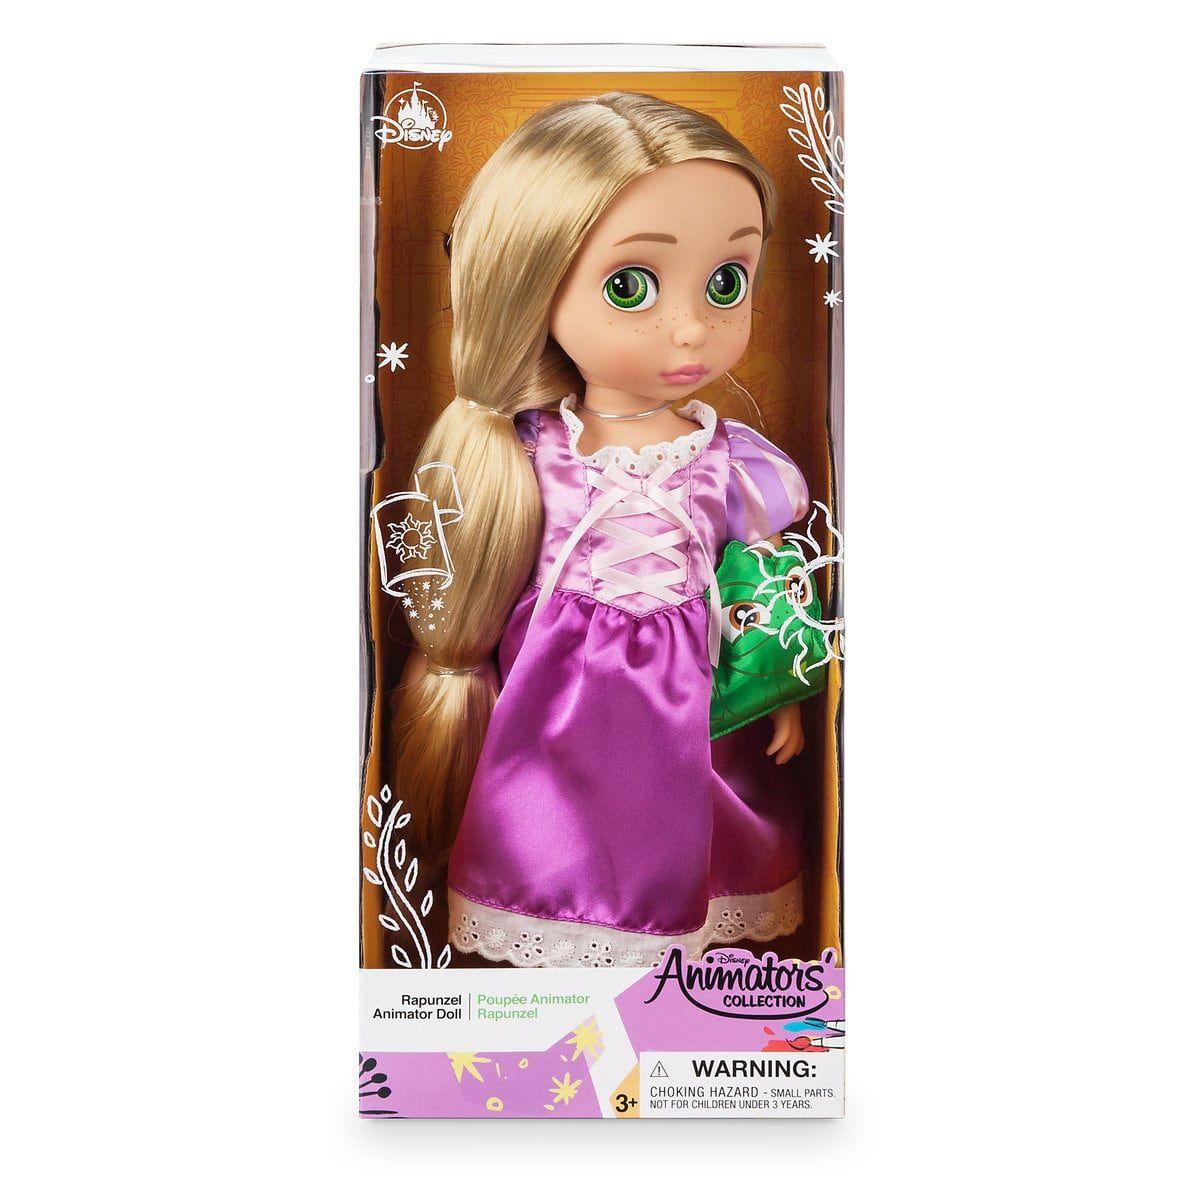 Boneca Rapunzel: Enrolados (Tangled) (Disney Animators' Collection) - Disney